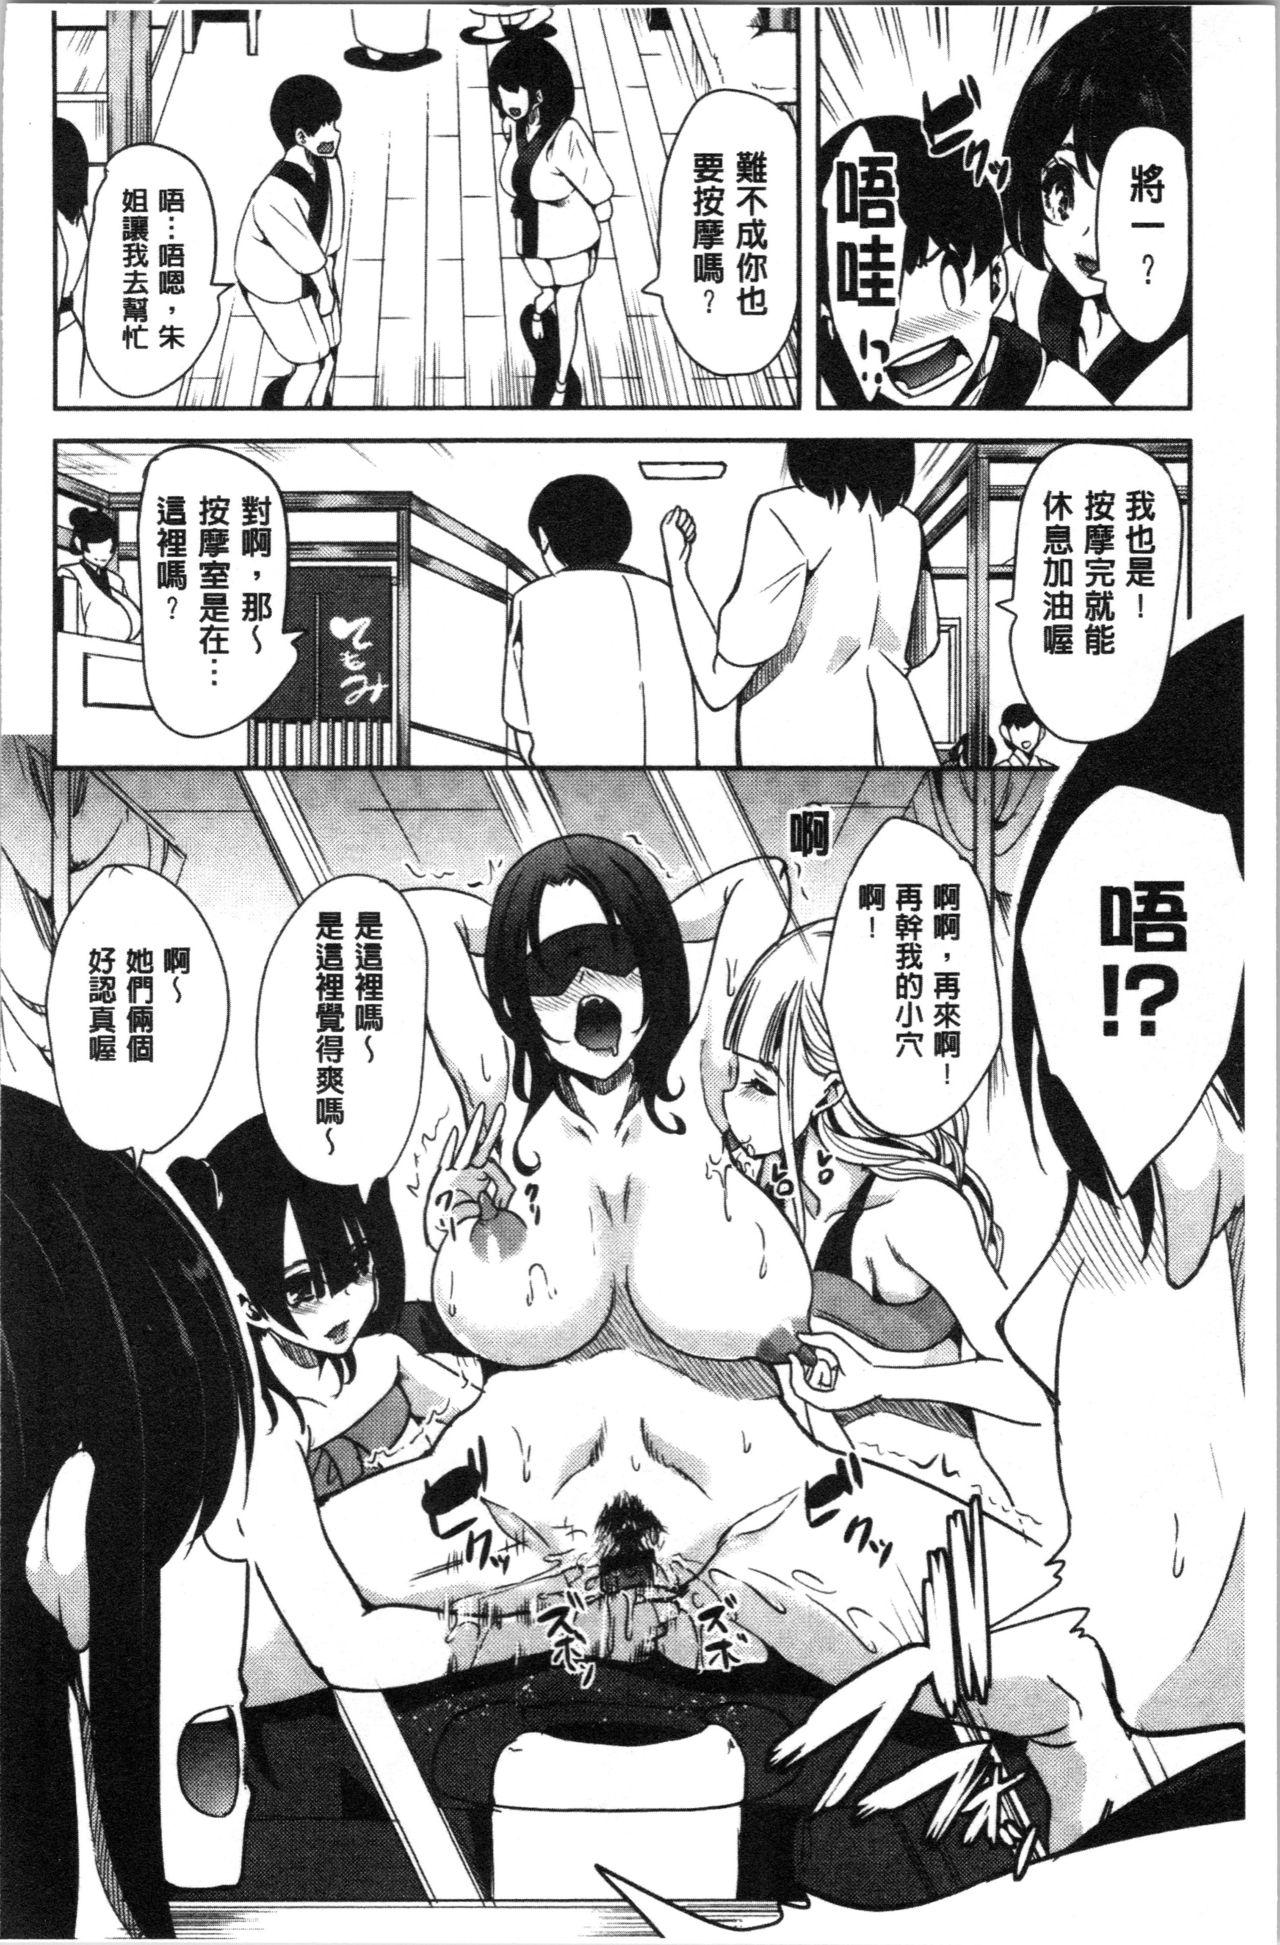 [Ootori Mahiro] Boku no Super Harem Sentou ~Otome no Naka ni Otoko wa Boku dake~ - My super harlem public bath, I am the only man in the public bath full of pussy cats. | 我的後宮選妃般的超級錢湯~乙女之間只有我一個男人~ [Chinese] 11